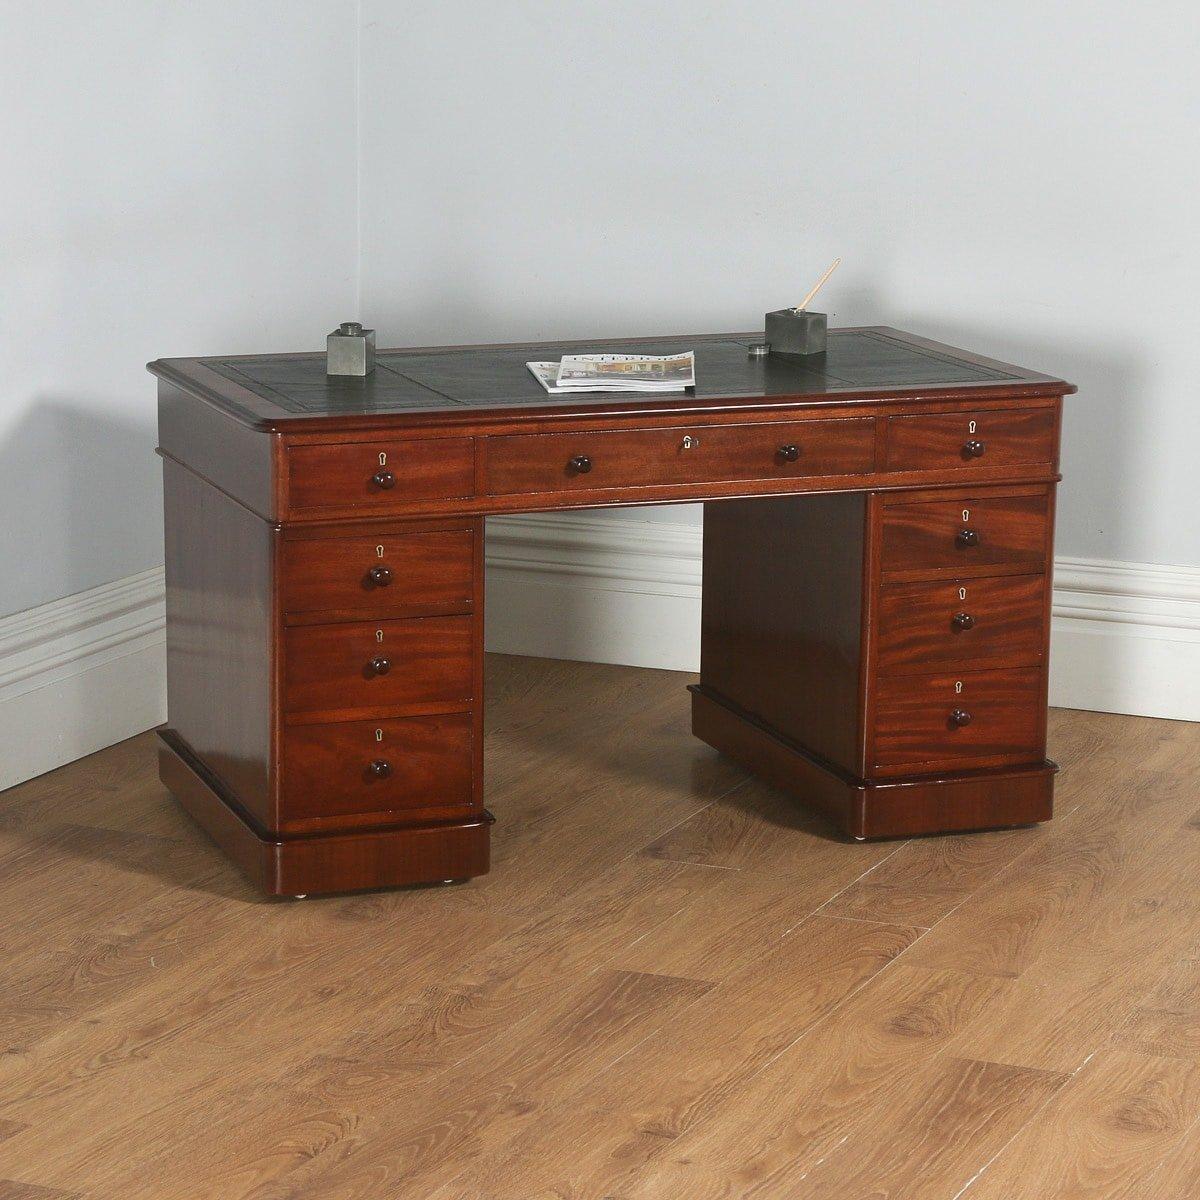 victorian office furniture. Antique English Victorian Mahogany \u0026 Leather 4ft 6\u201d Pedestal Office Desk (Circa 1860) Furniture O